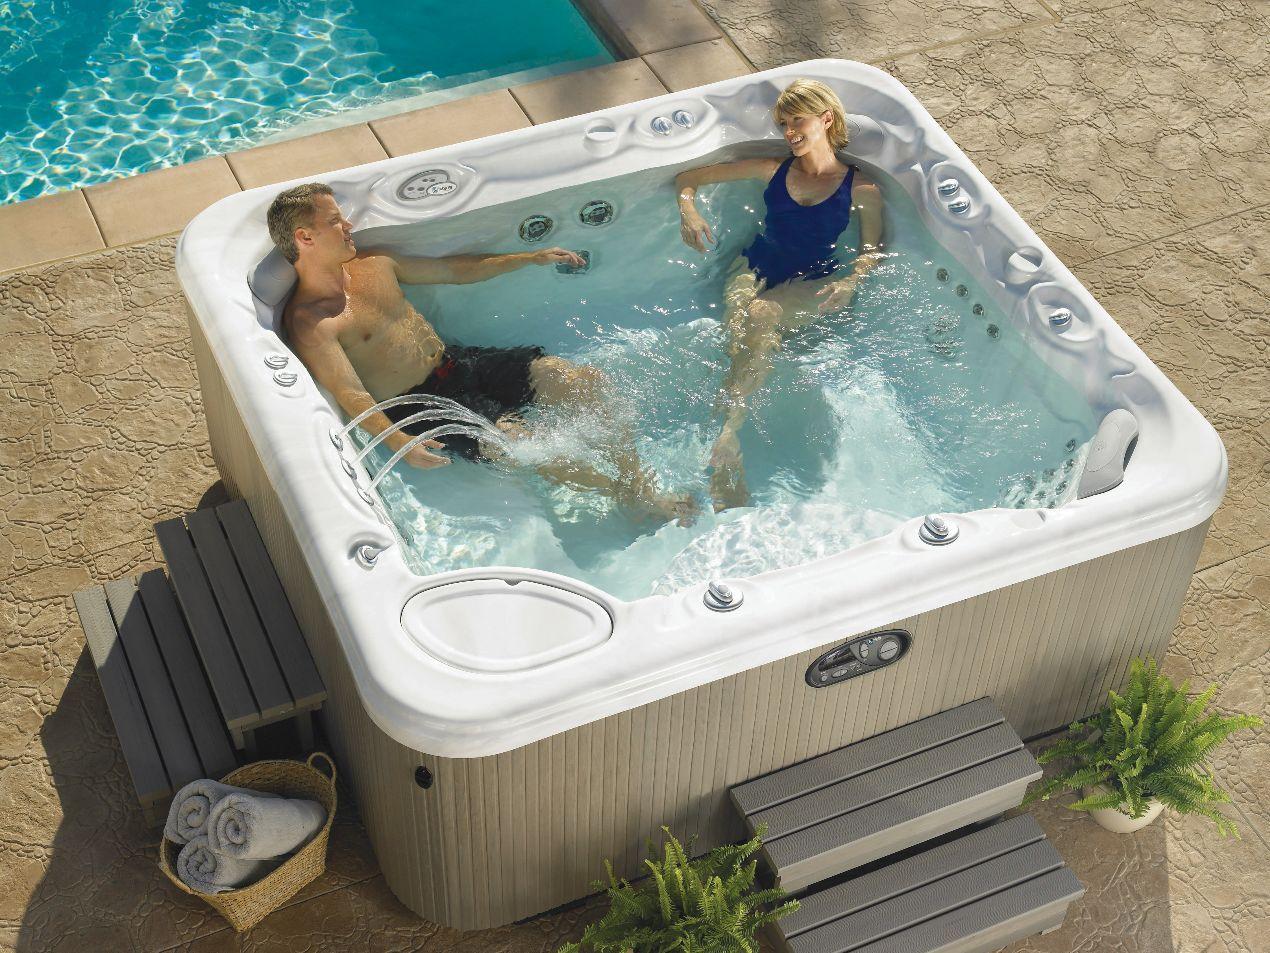 hot tub | HOT TUB SPECIALS #homedesignidaes #home #hottub | Hot ...